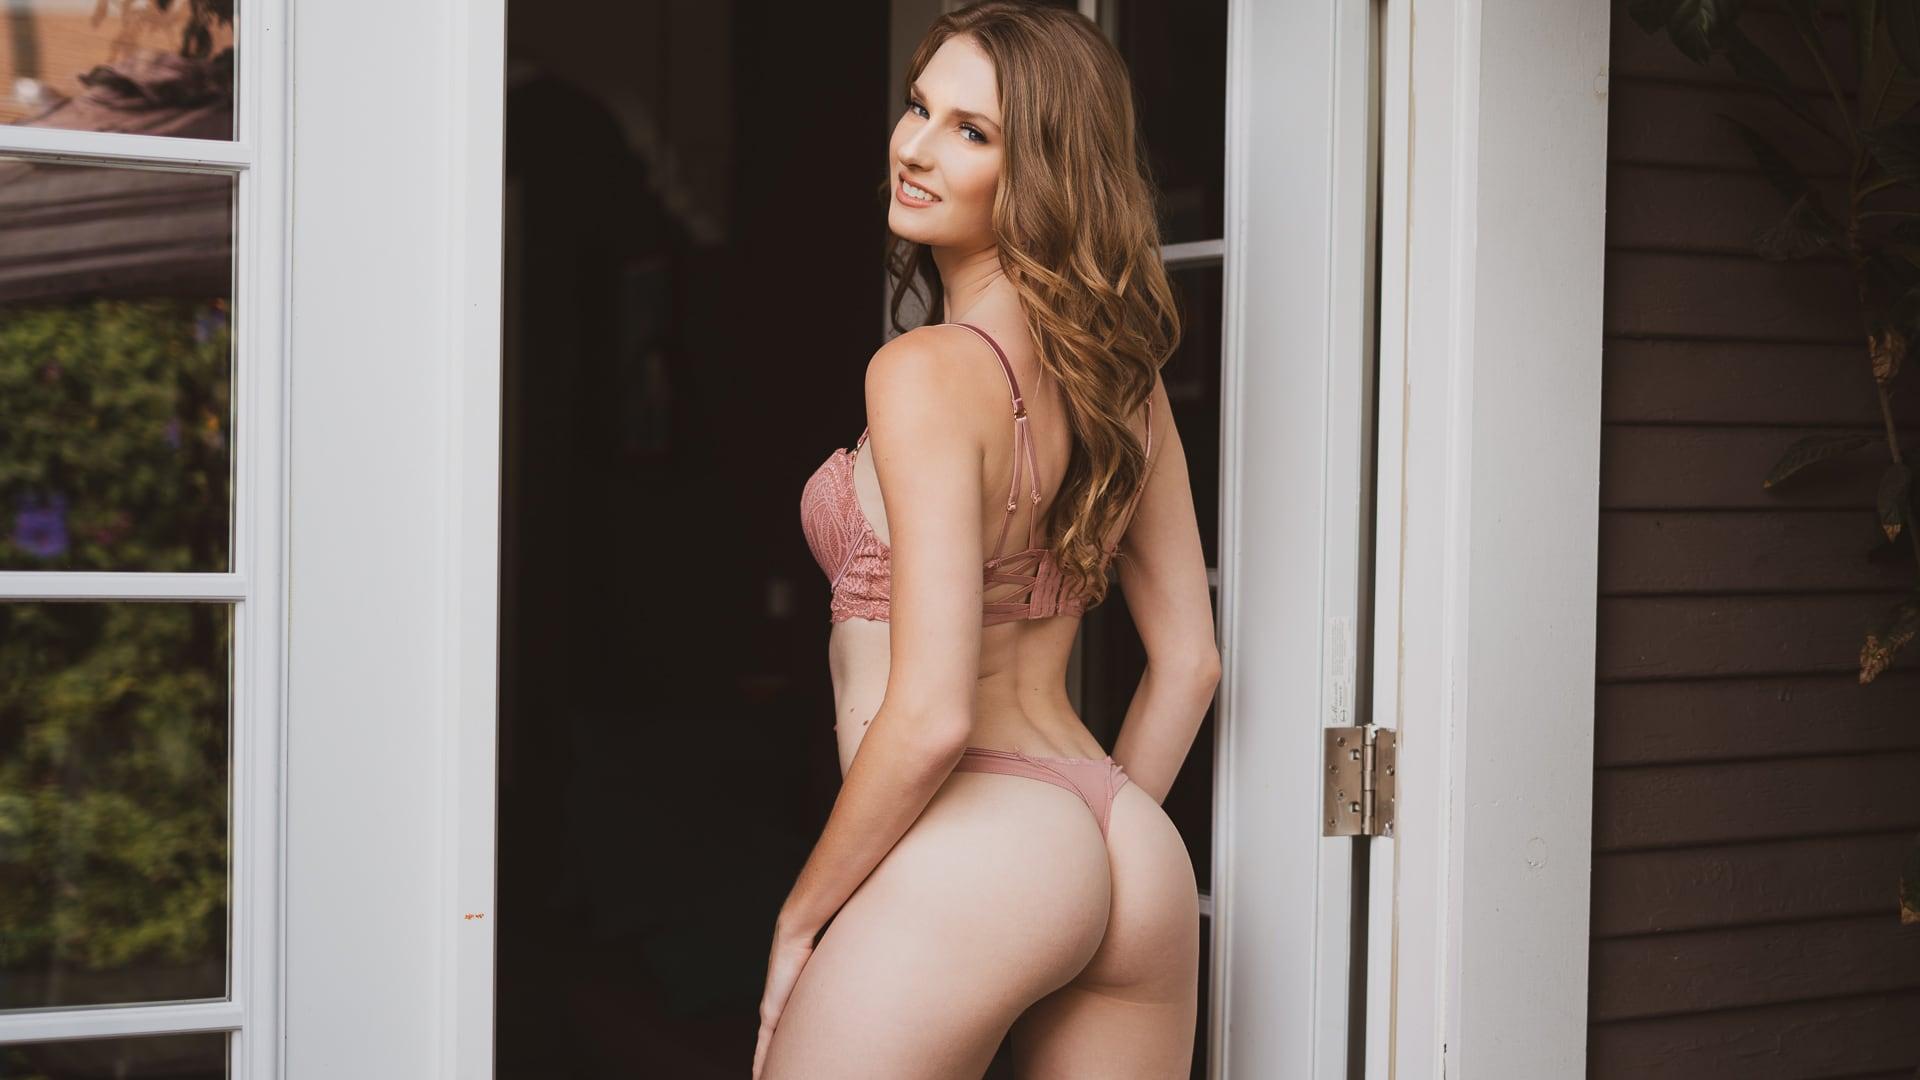 Pornostar ashley australia naked pics